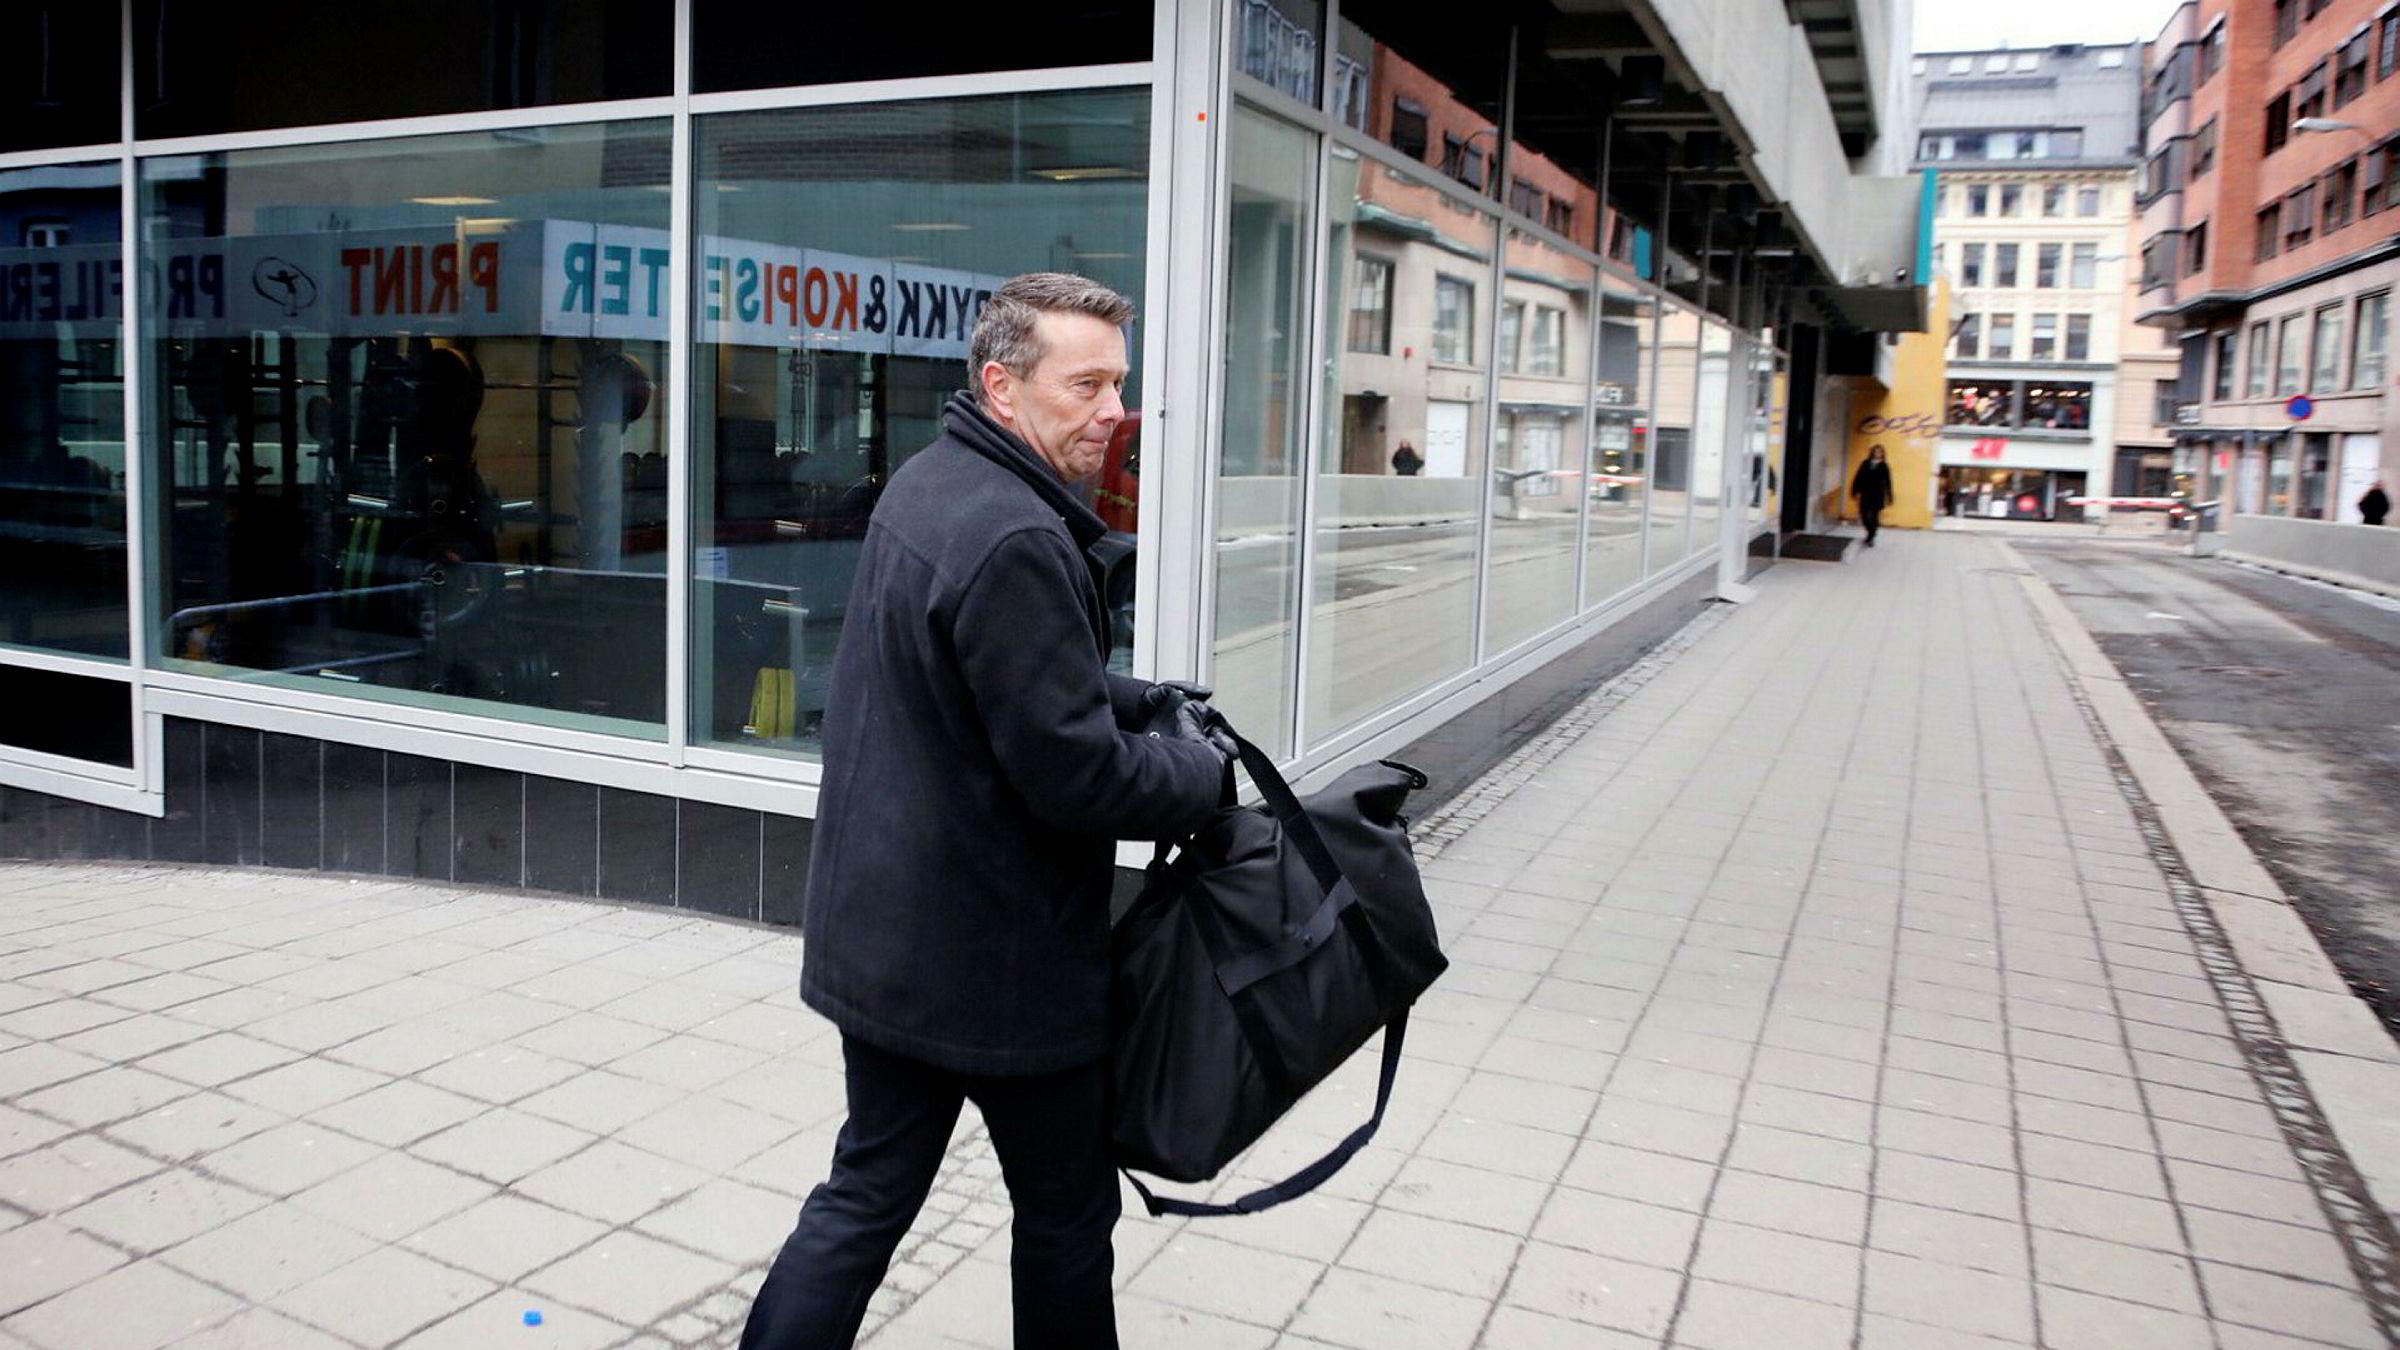 Styreleder Tomas Brunegård i Mentor Medier utenfor kontorene til Mentor Medier torsdag morgen. Foto: